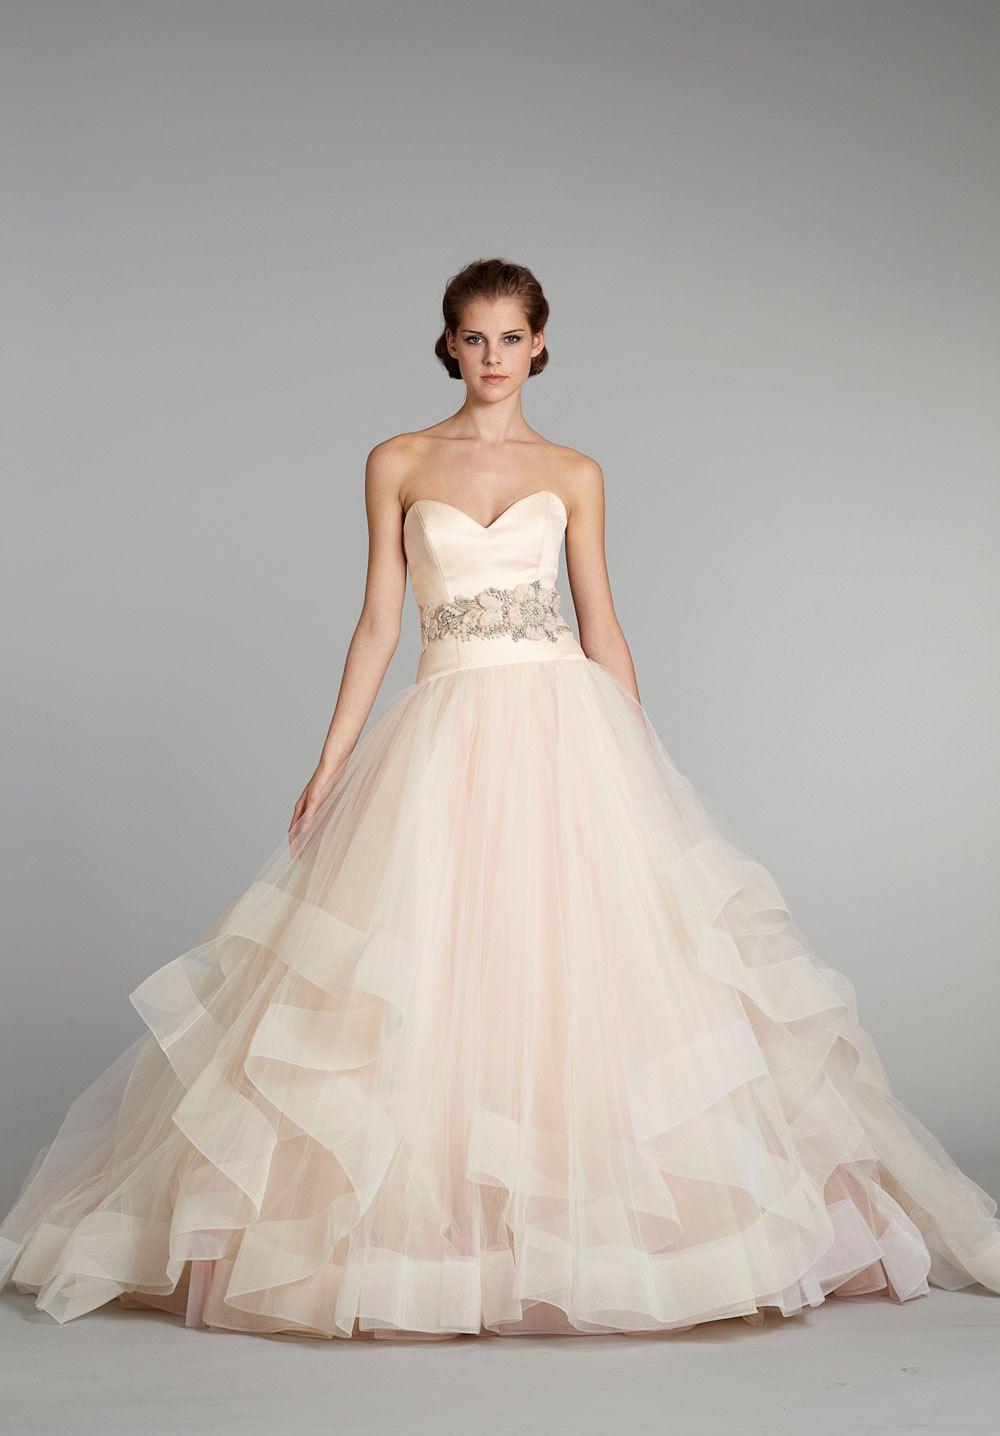 Fall-2012-wedding-dress-lazaro-bridal-gowns-3250-ballgown-sweetheart.full